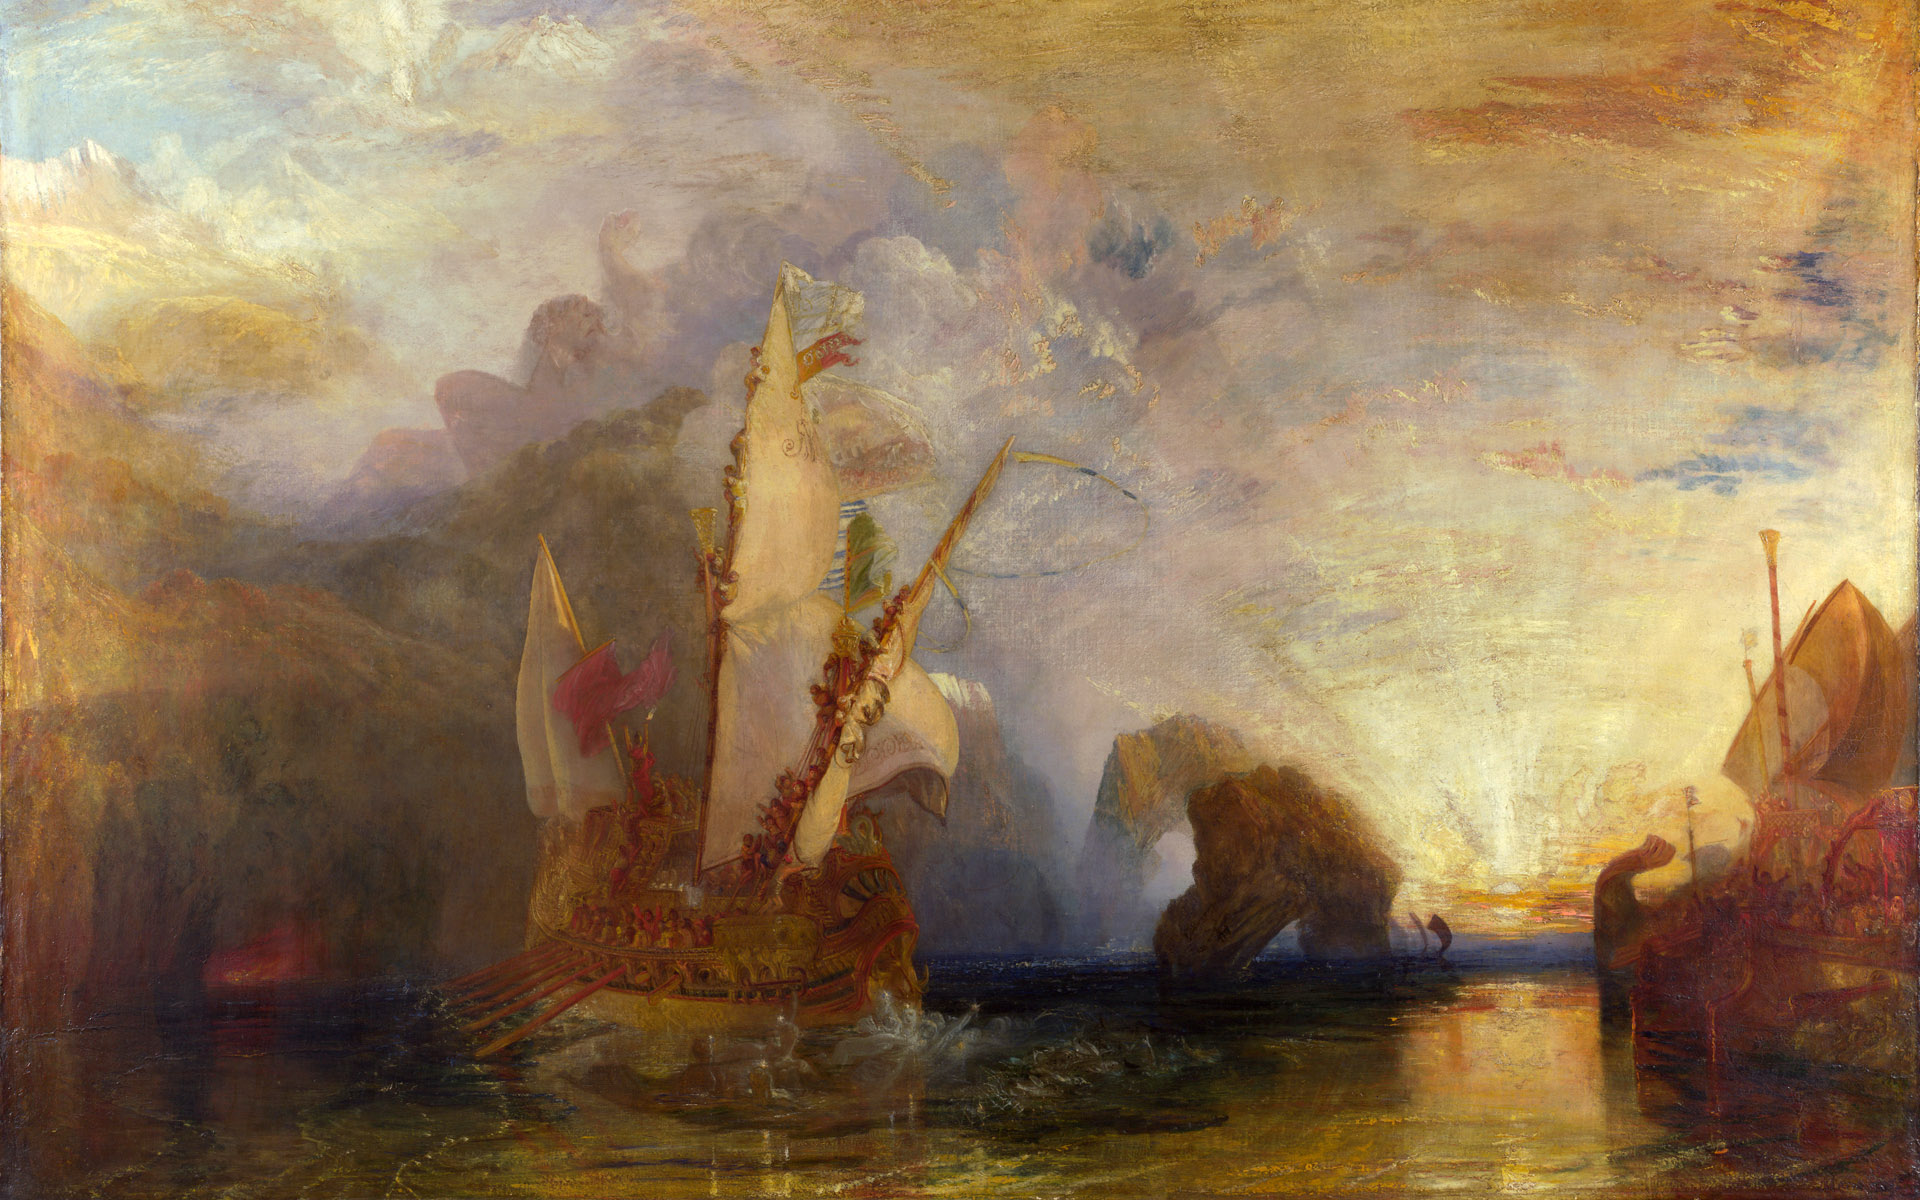 Ulysses Deriding Polyphemus. J. M. W. Turner, 1829. Creative Commons.